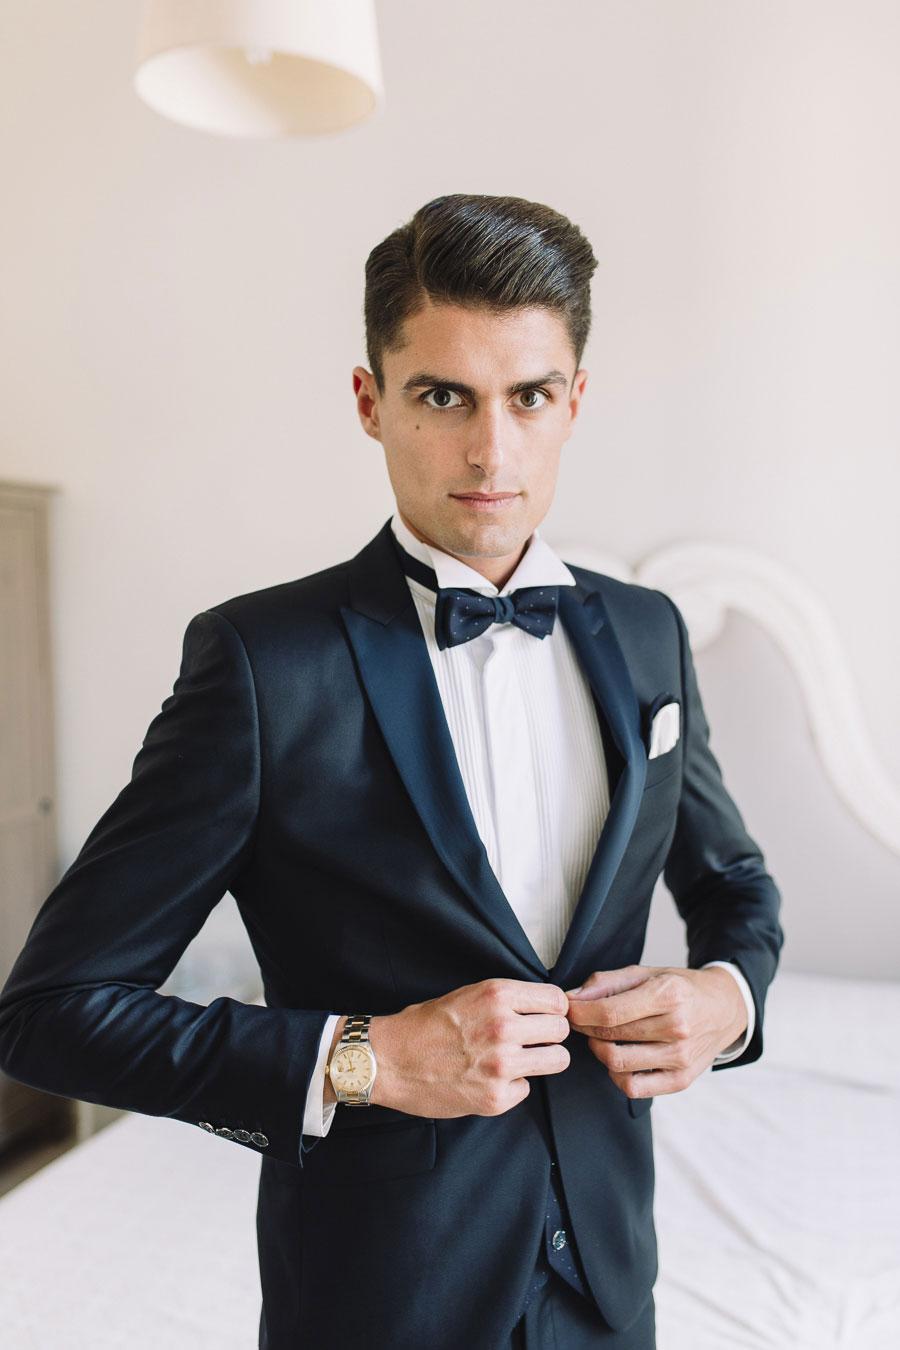 Wedding-Nicholad-and-Federica-Giuseppe-Giovannelli-299